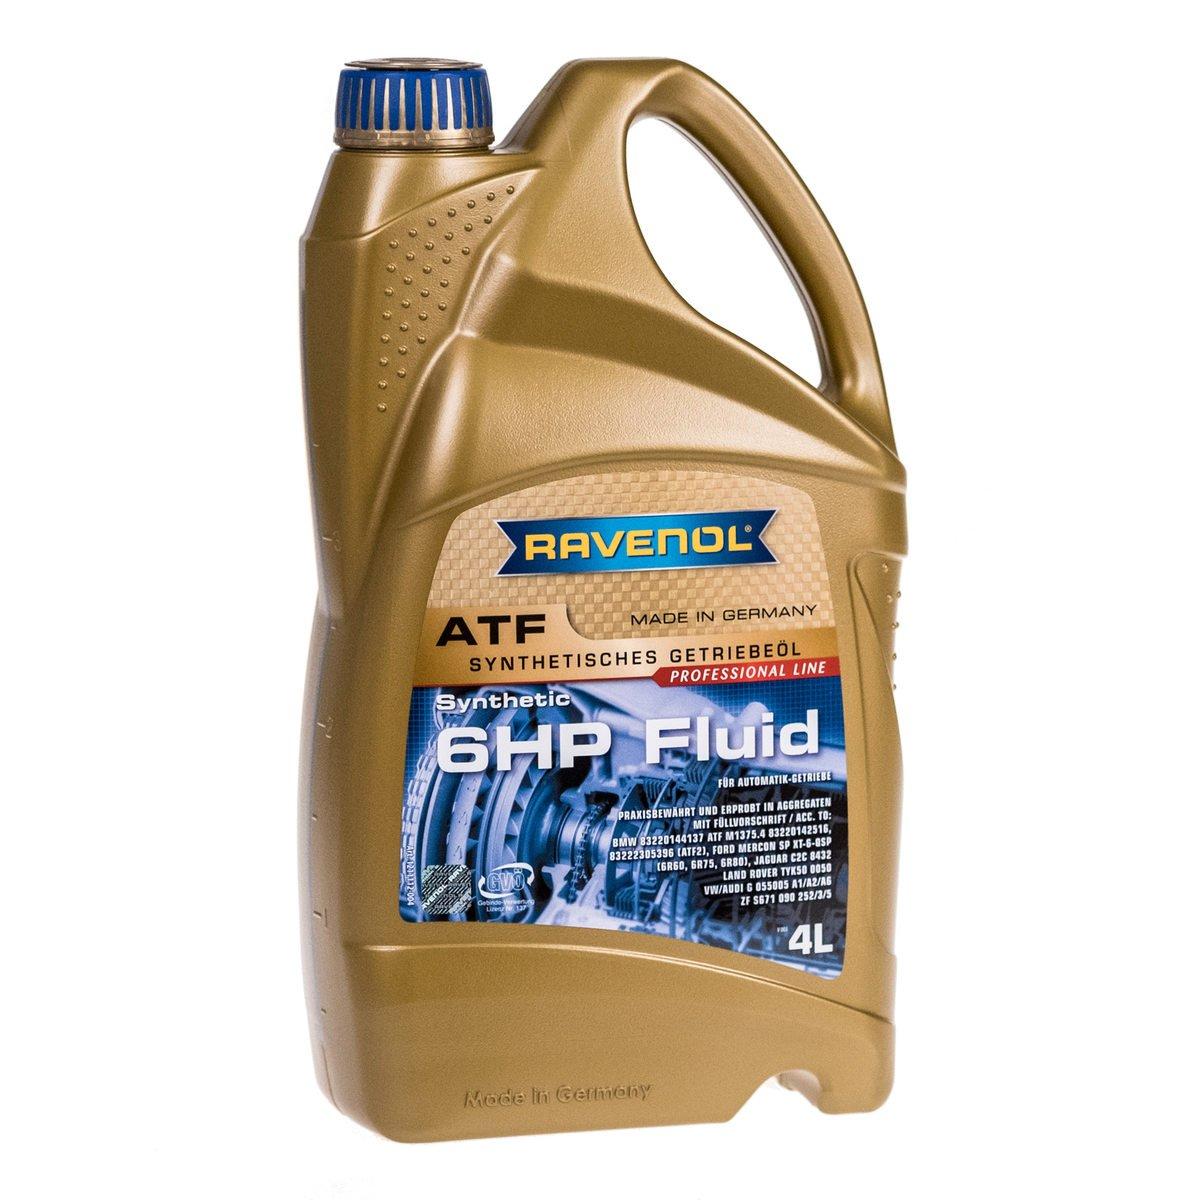 Ravenol J1D2110-004 ATF (Automatic Transmission Fluid) - 6HP Fluid for ZF 6HP Transmissions (4 Liter)